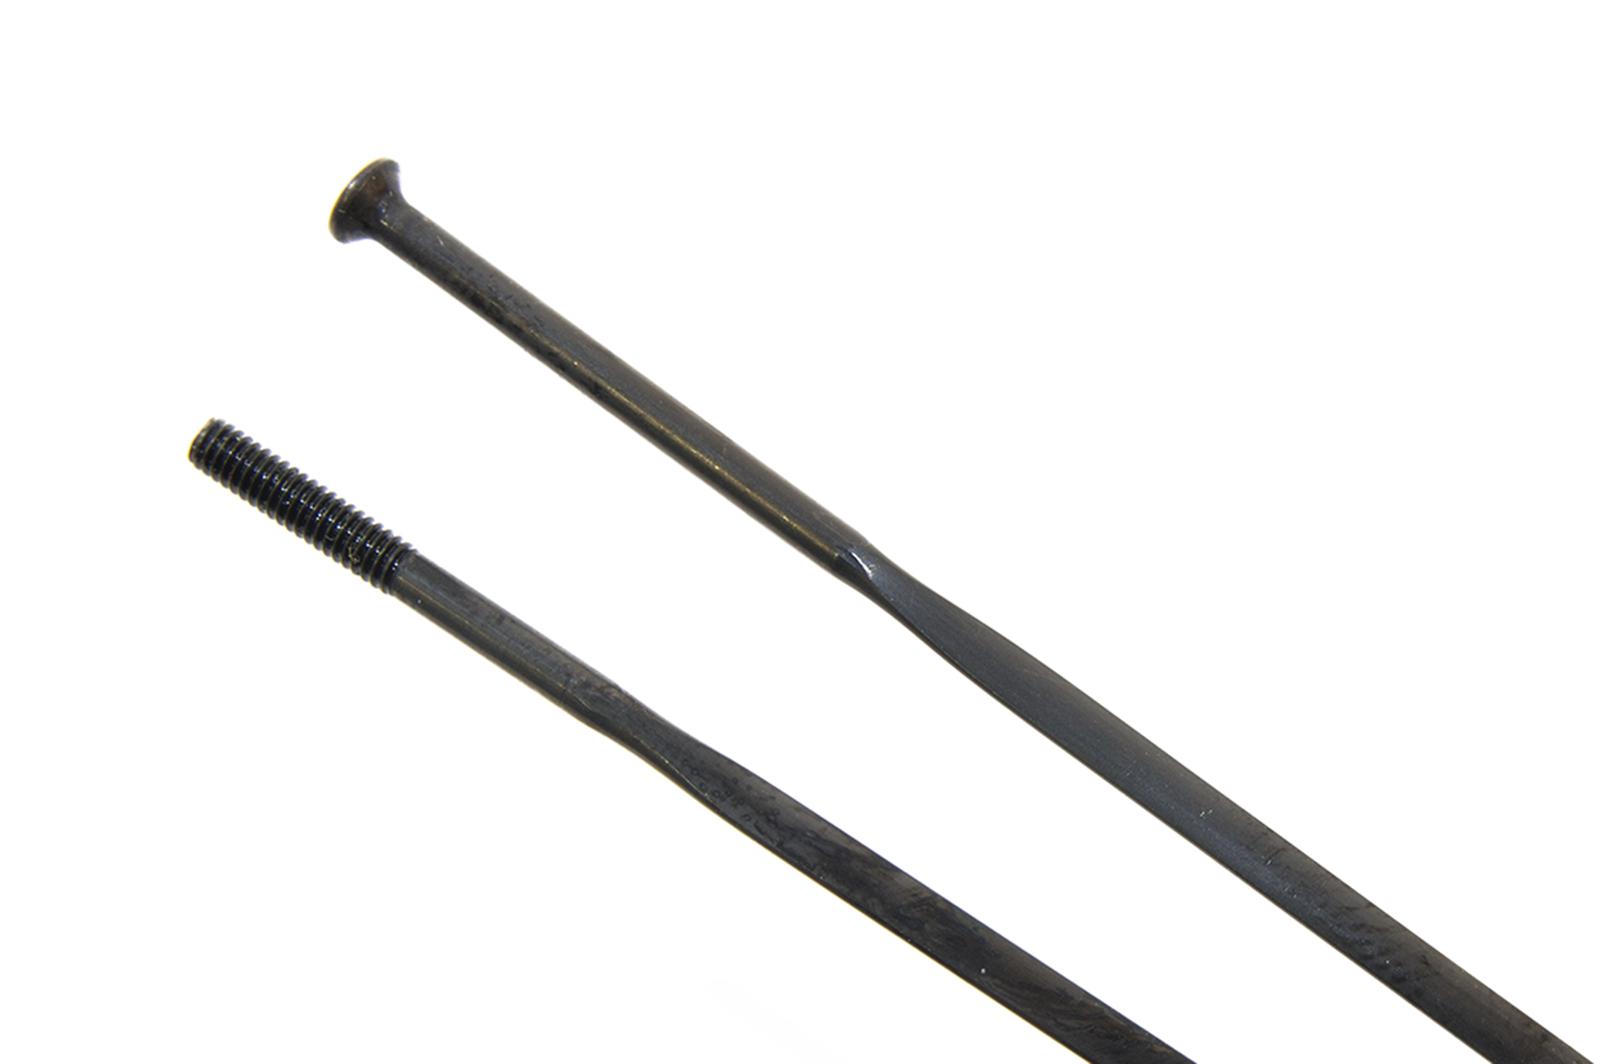 Sapim CX-RAY Silver /& Black Stainless Steel Aero Flat Bladed Spokes black 248mm